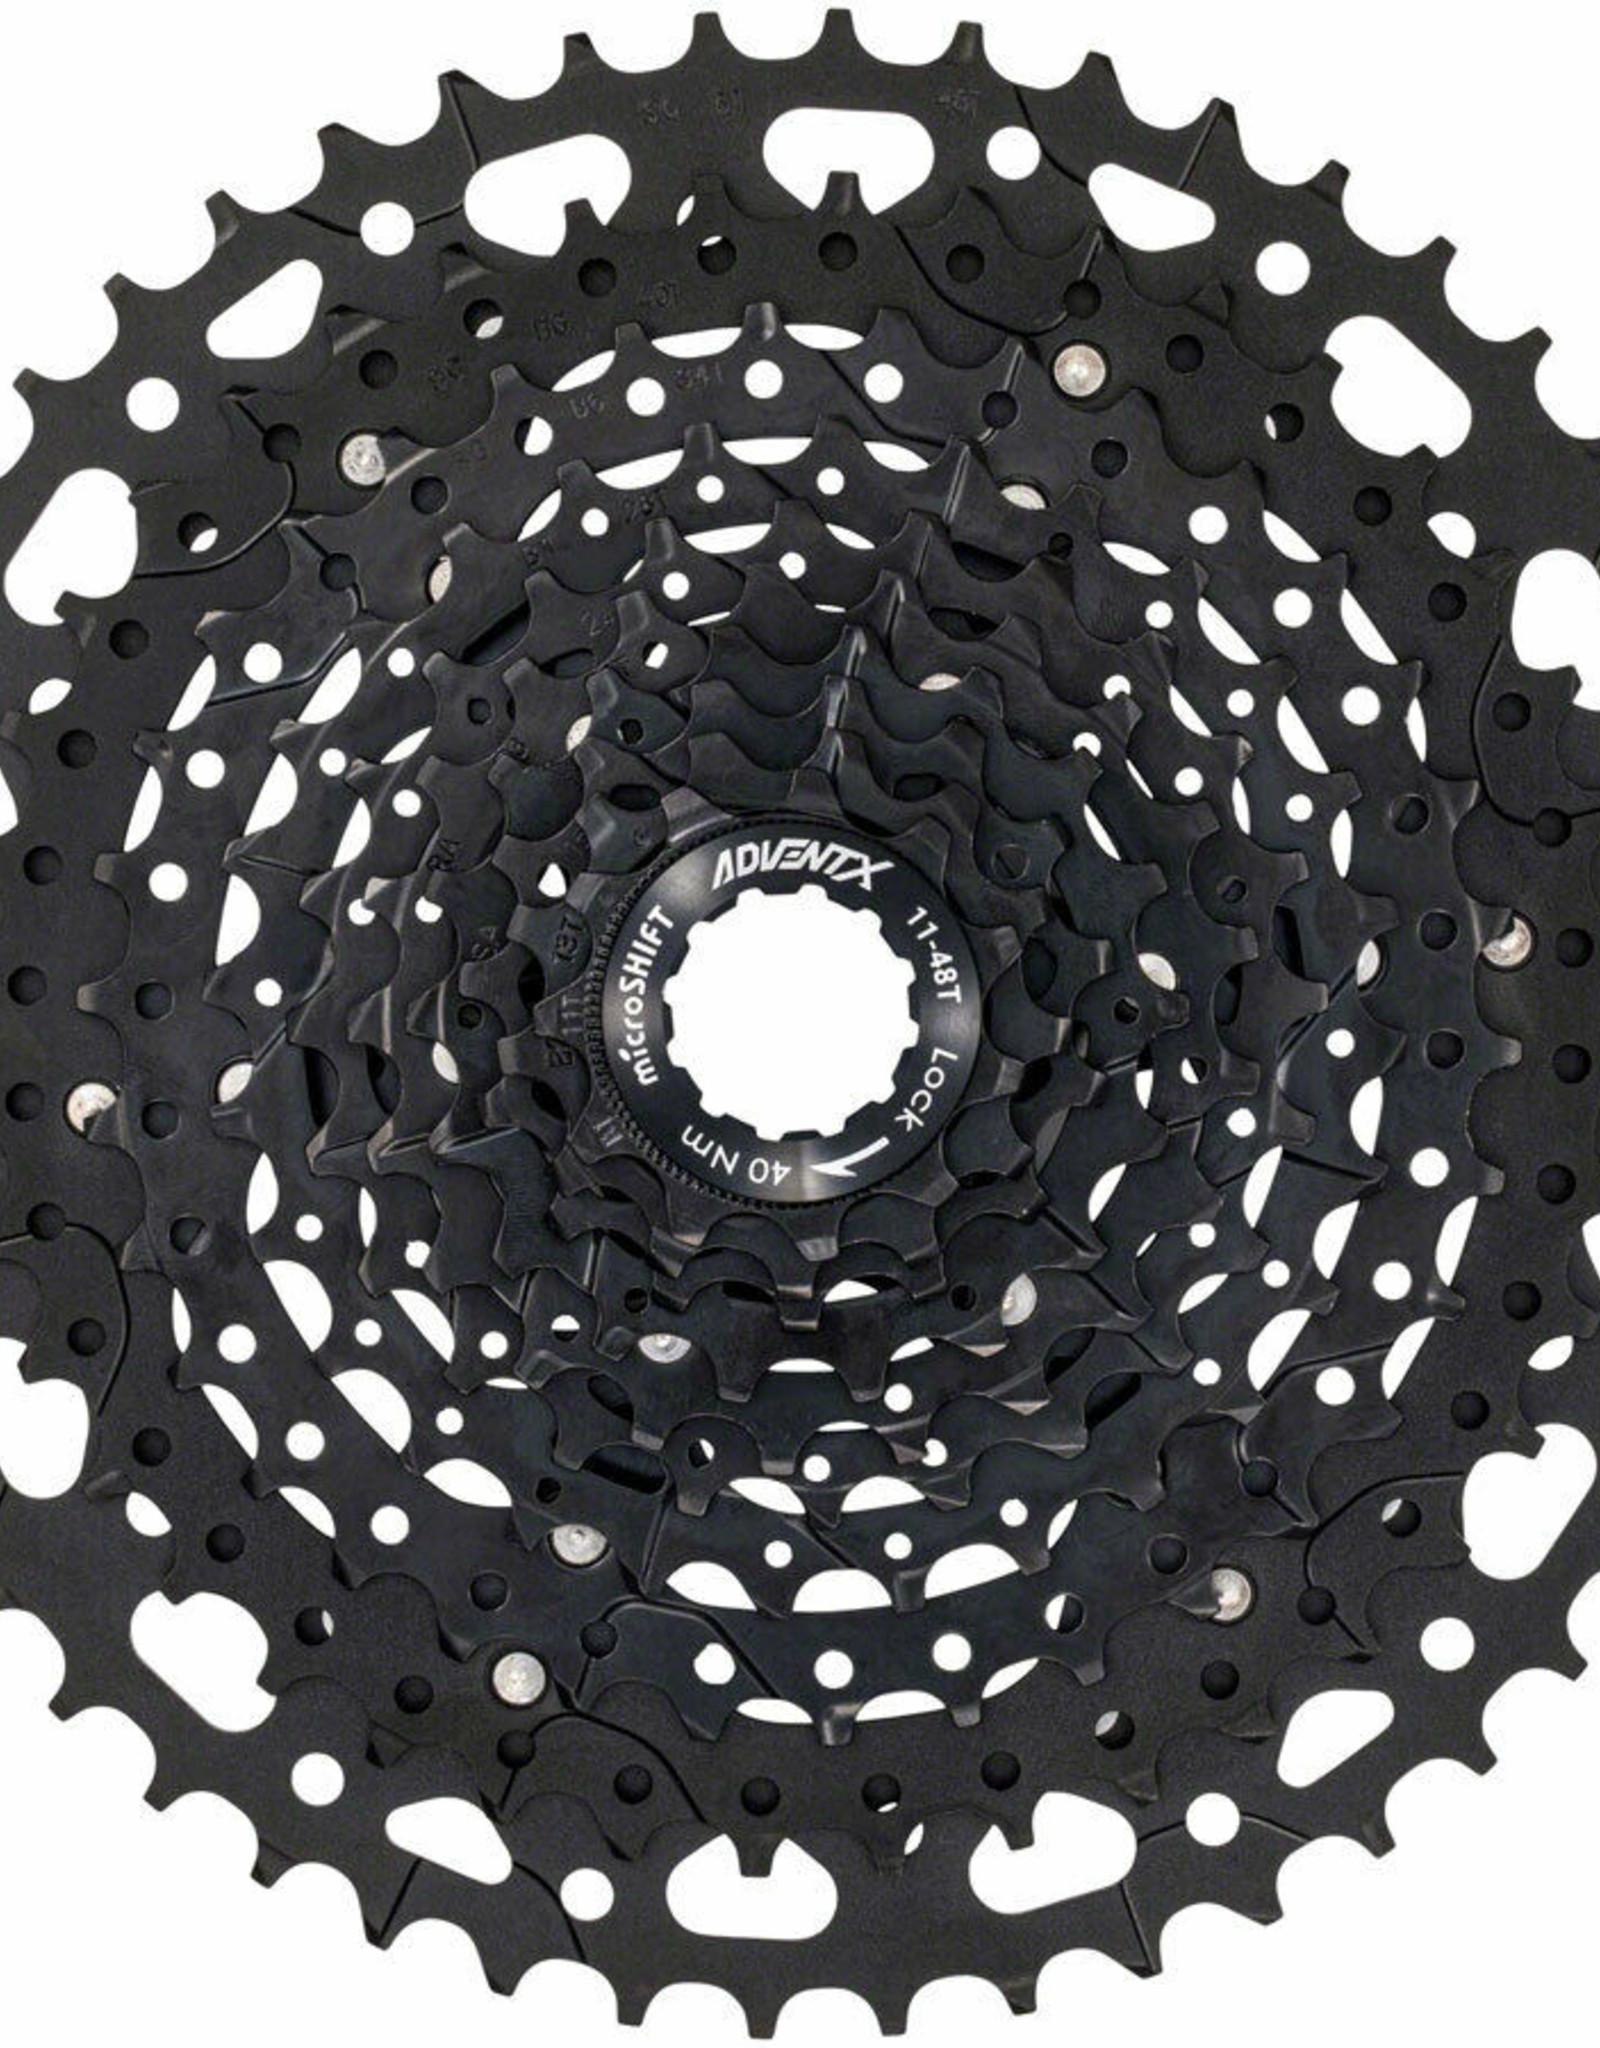 microSHIFT microSHIFT ADVENT X Cassette - 10 Speed, 11-48t, Black, Alloy Spider